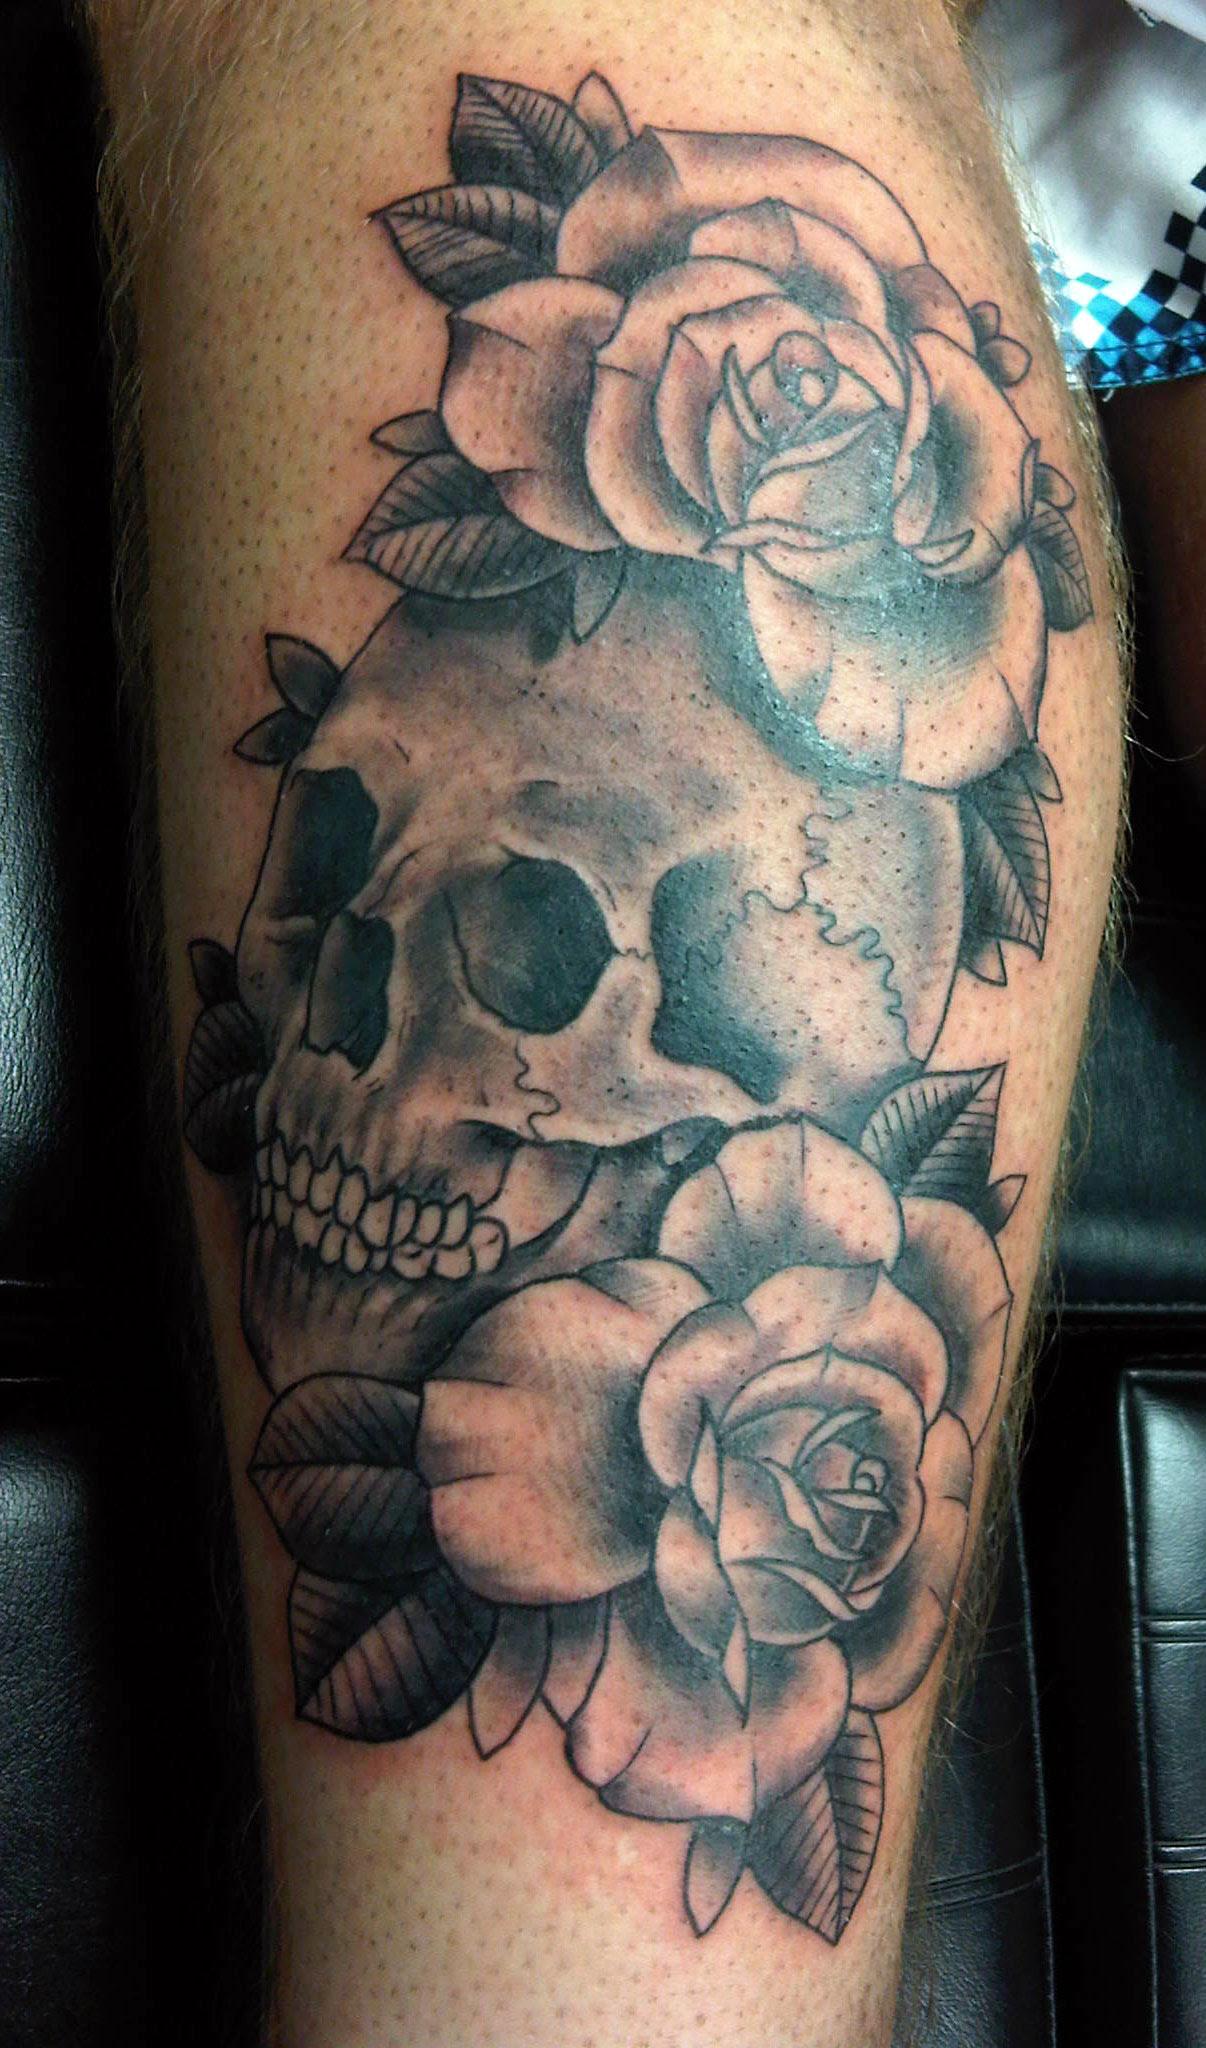 Roses Tattoo Ideas Cool Tattoos Bonbaden